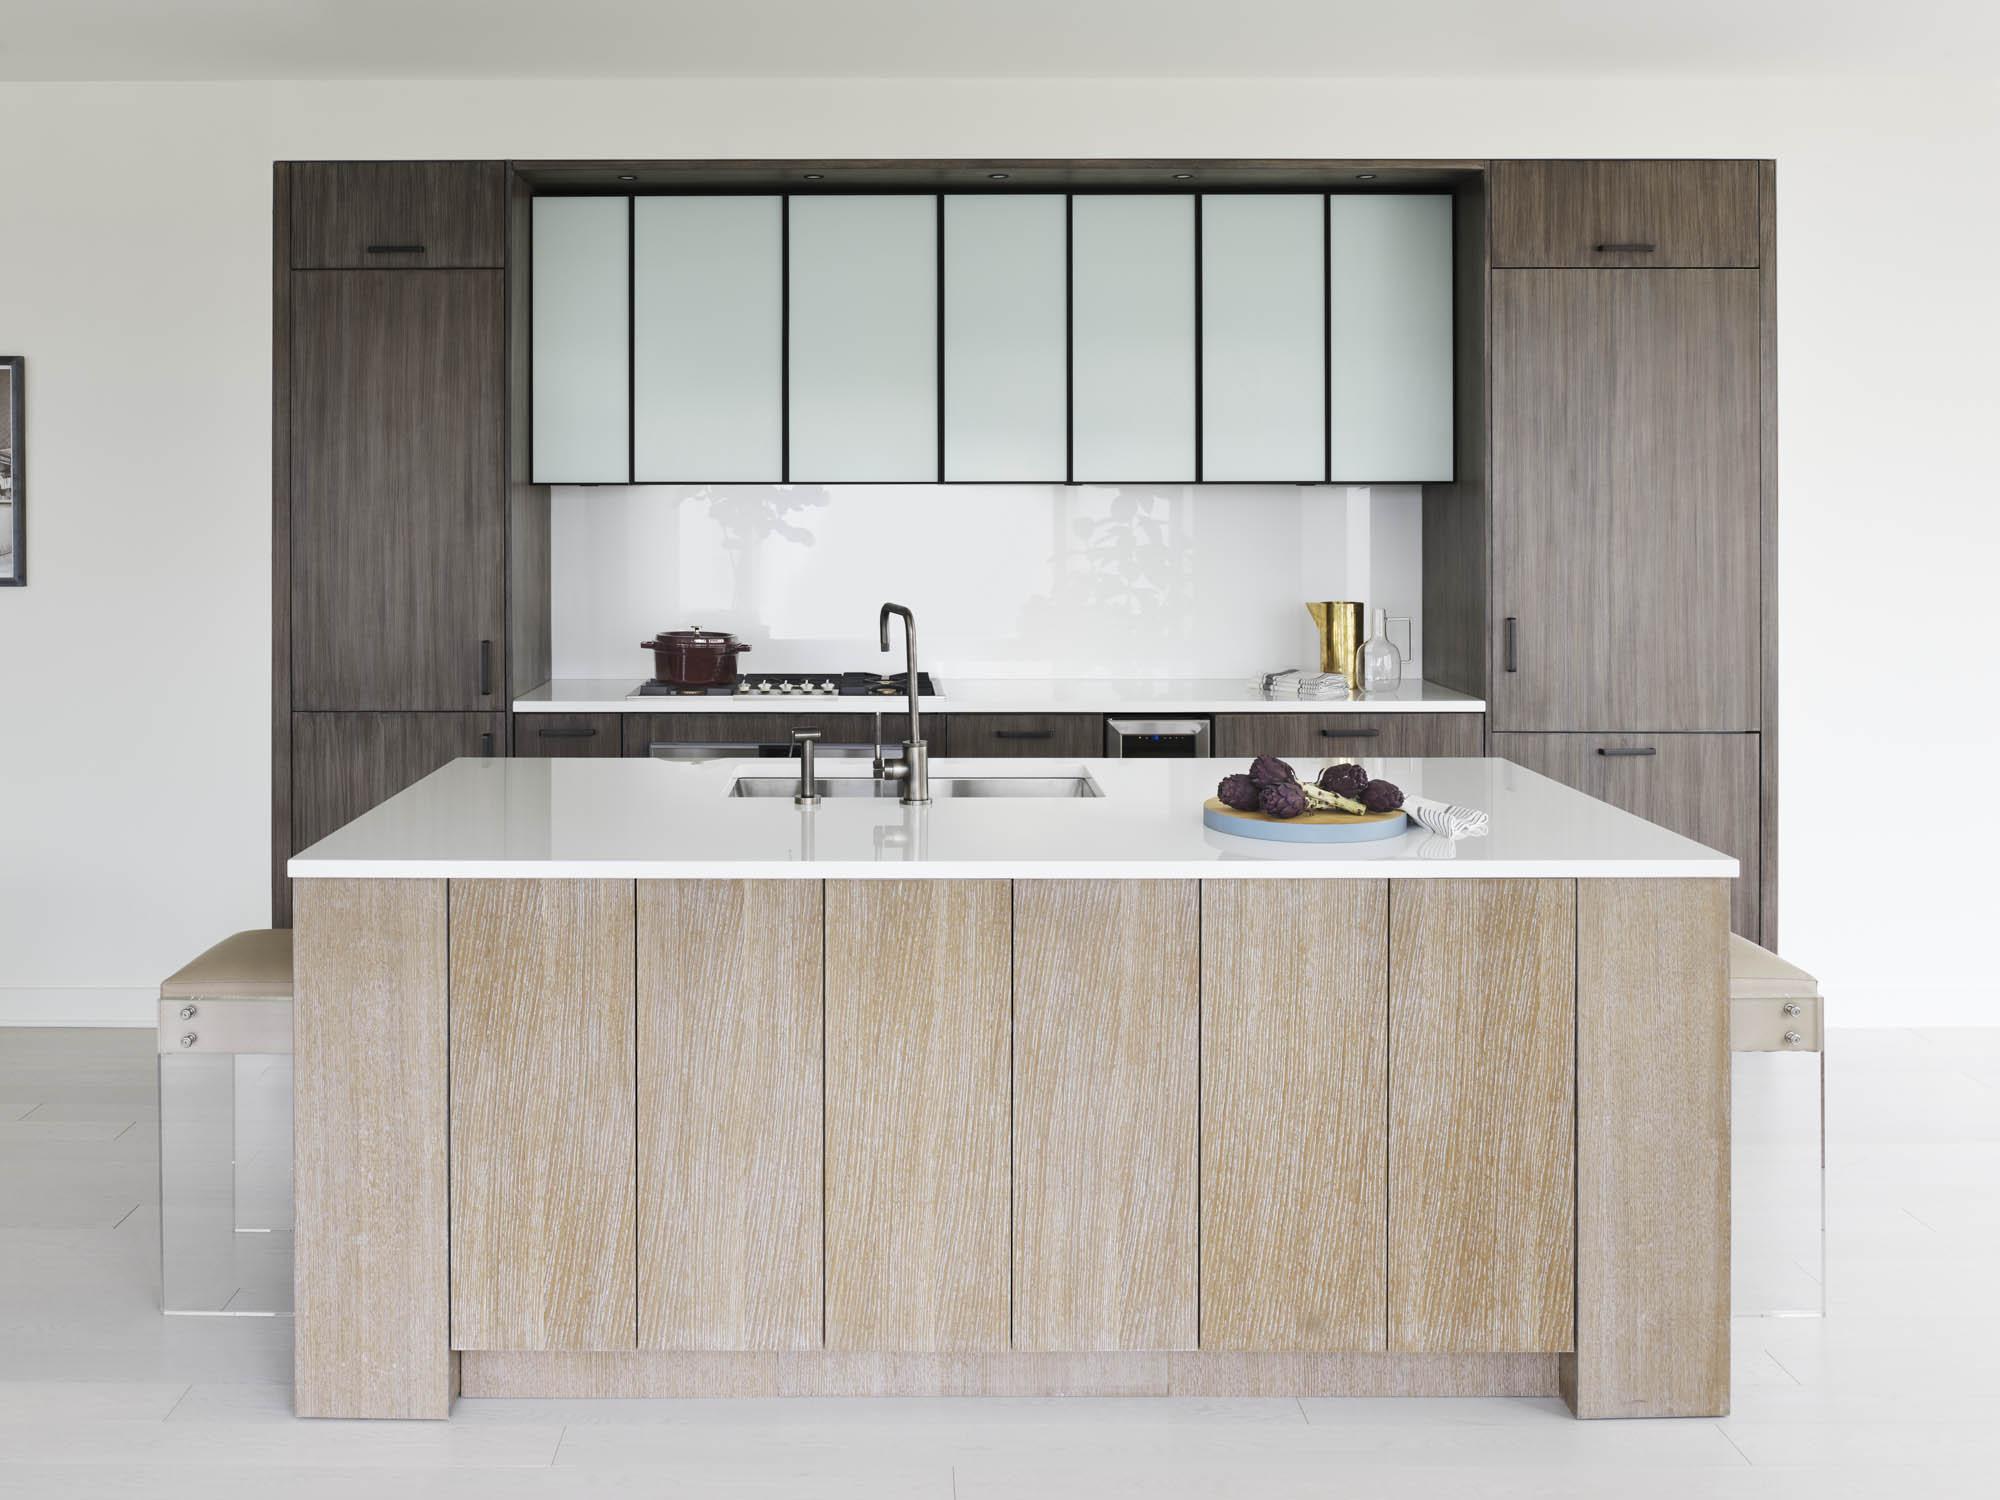 The Sutton Condominium Sales Office Kitchen